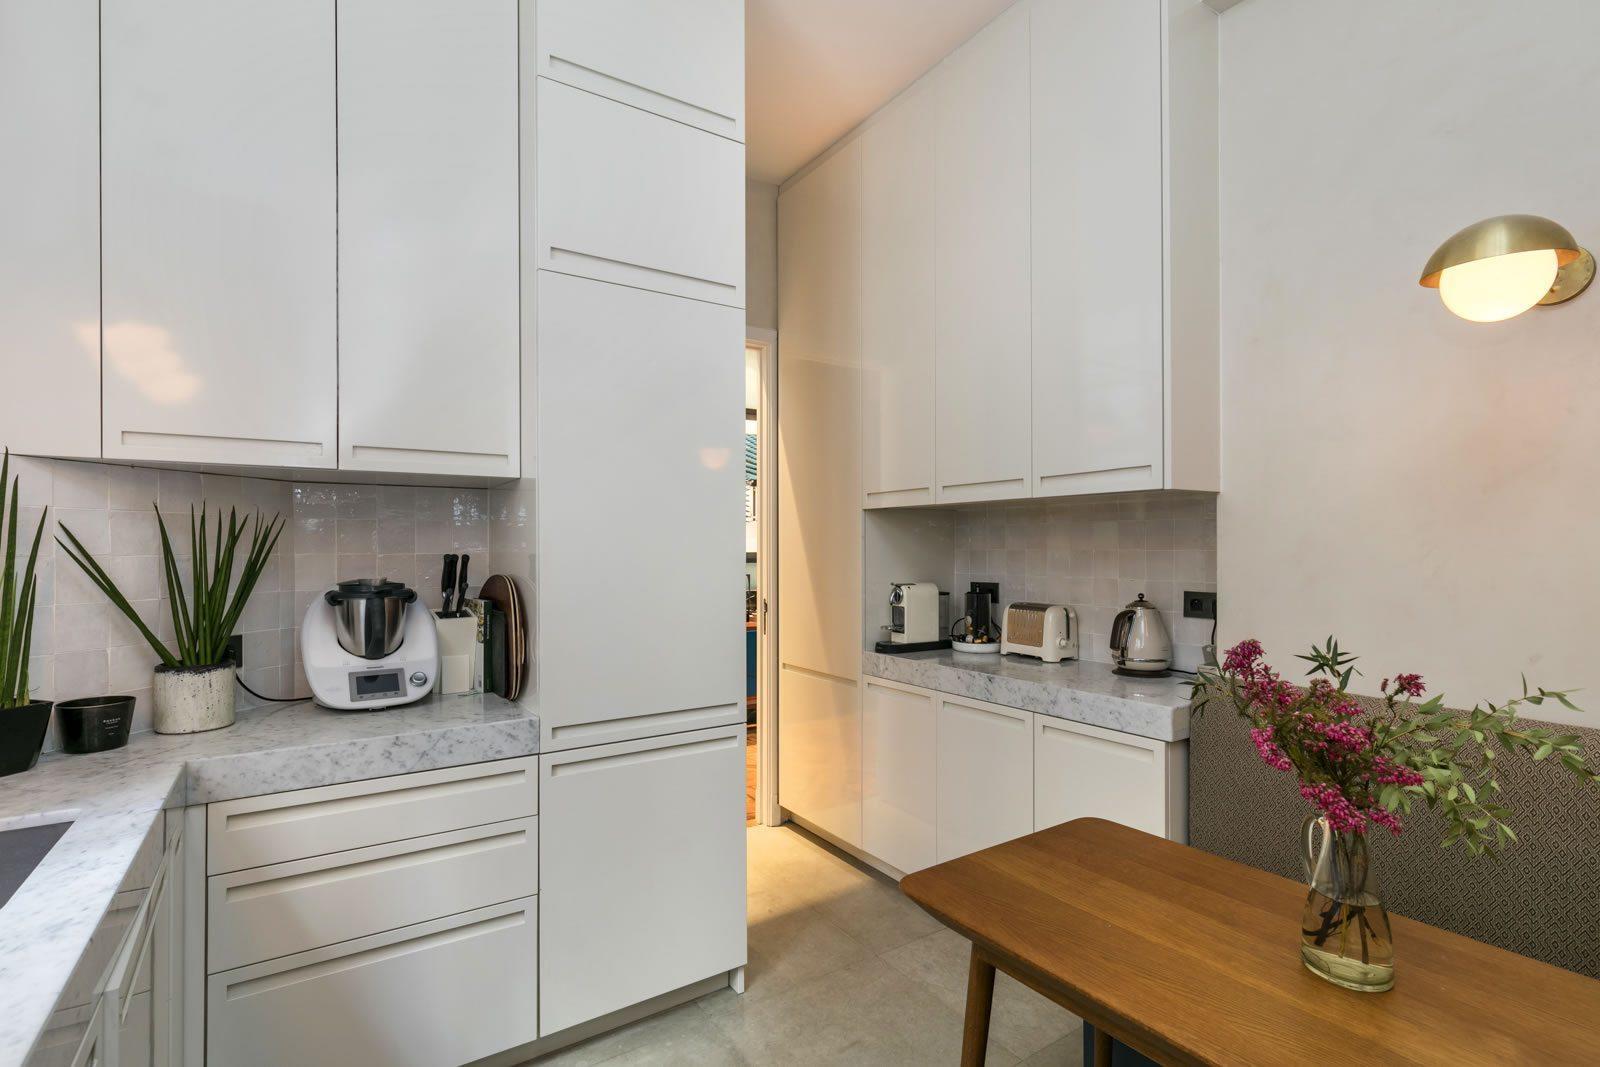 appartement-exceptionnel-a-vendre-jardin-paysager-amenageappartement-exceptionnel-a-vendre-jardin-paysager-amenage